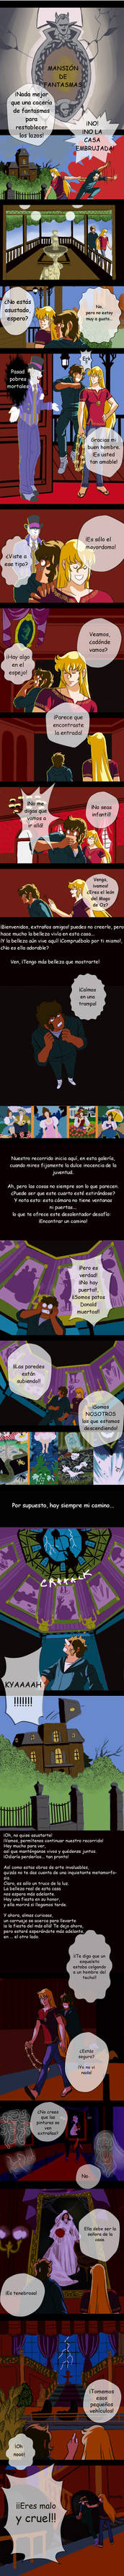 saintseiya parodie 12 part 2 (SPANISH) by kori